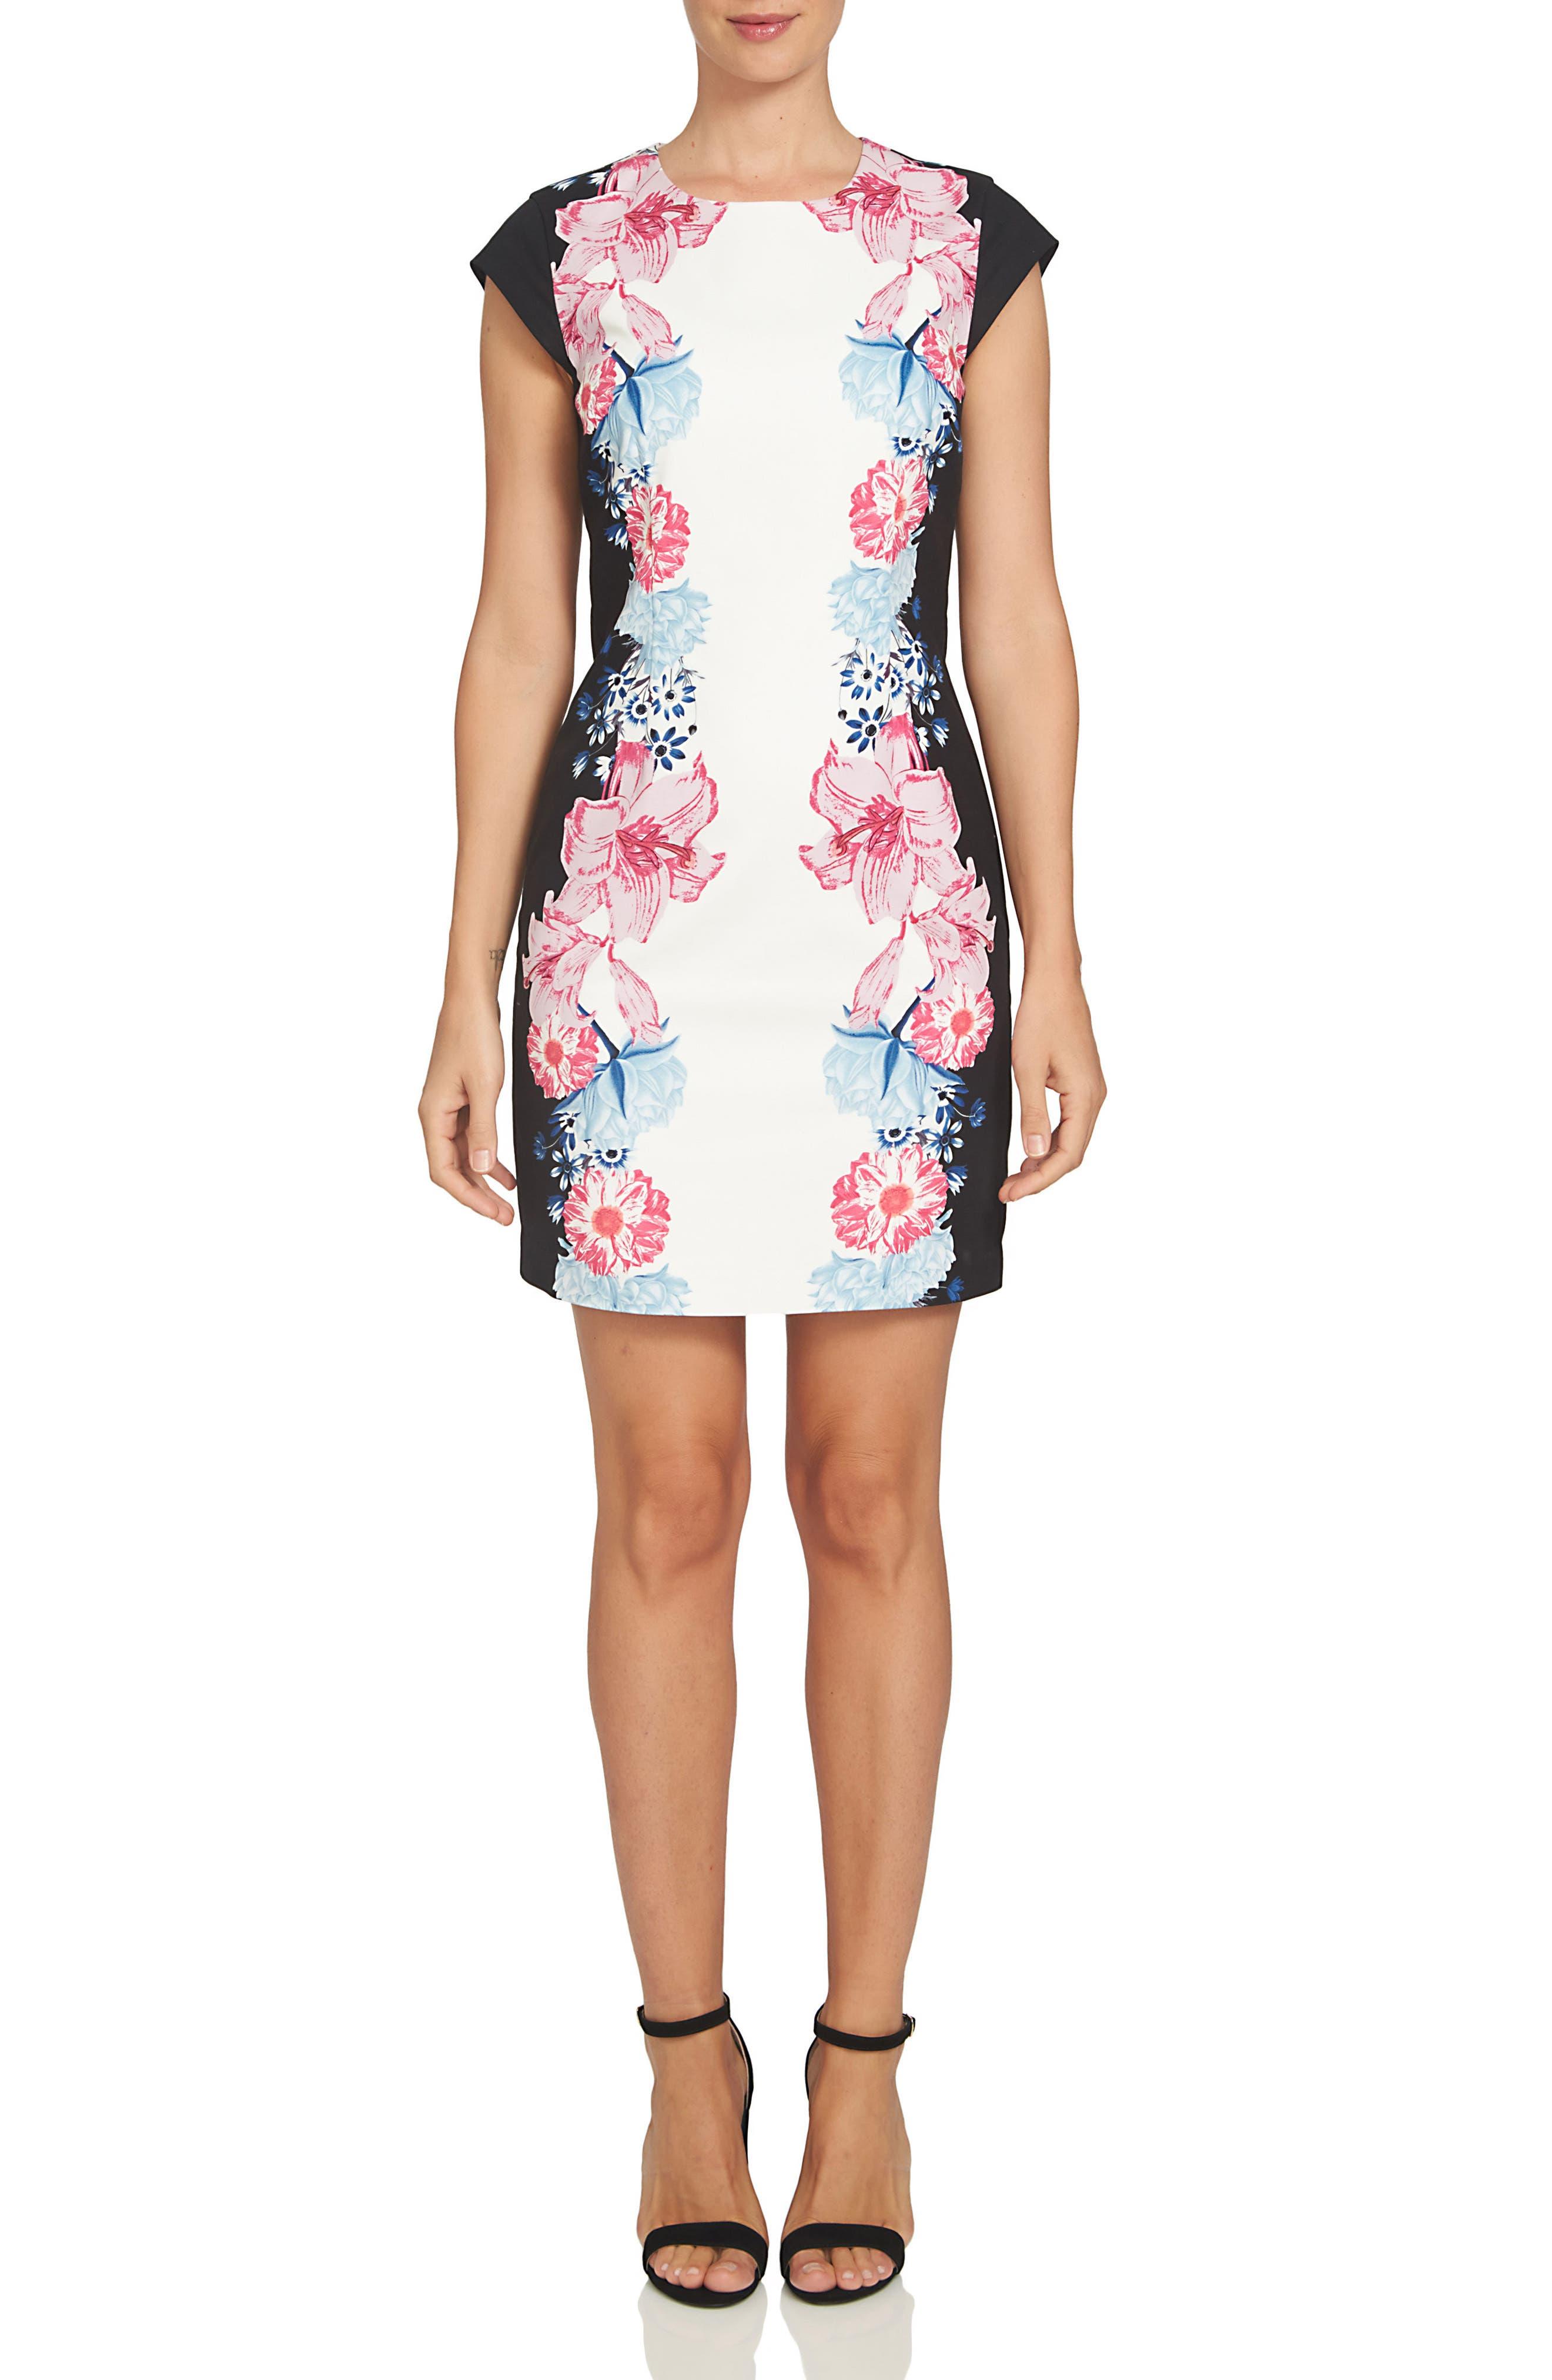 Alternate Image 1 Selected - CeCe Colorblock Floral Sheath Dress